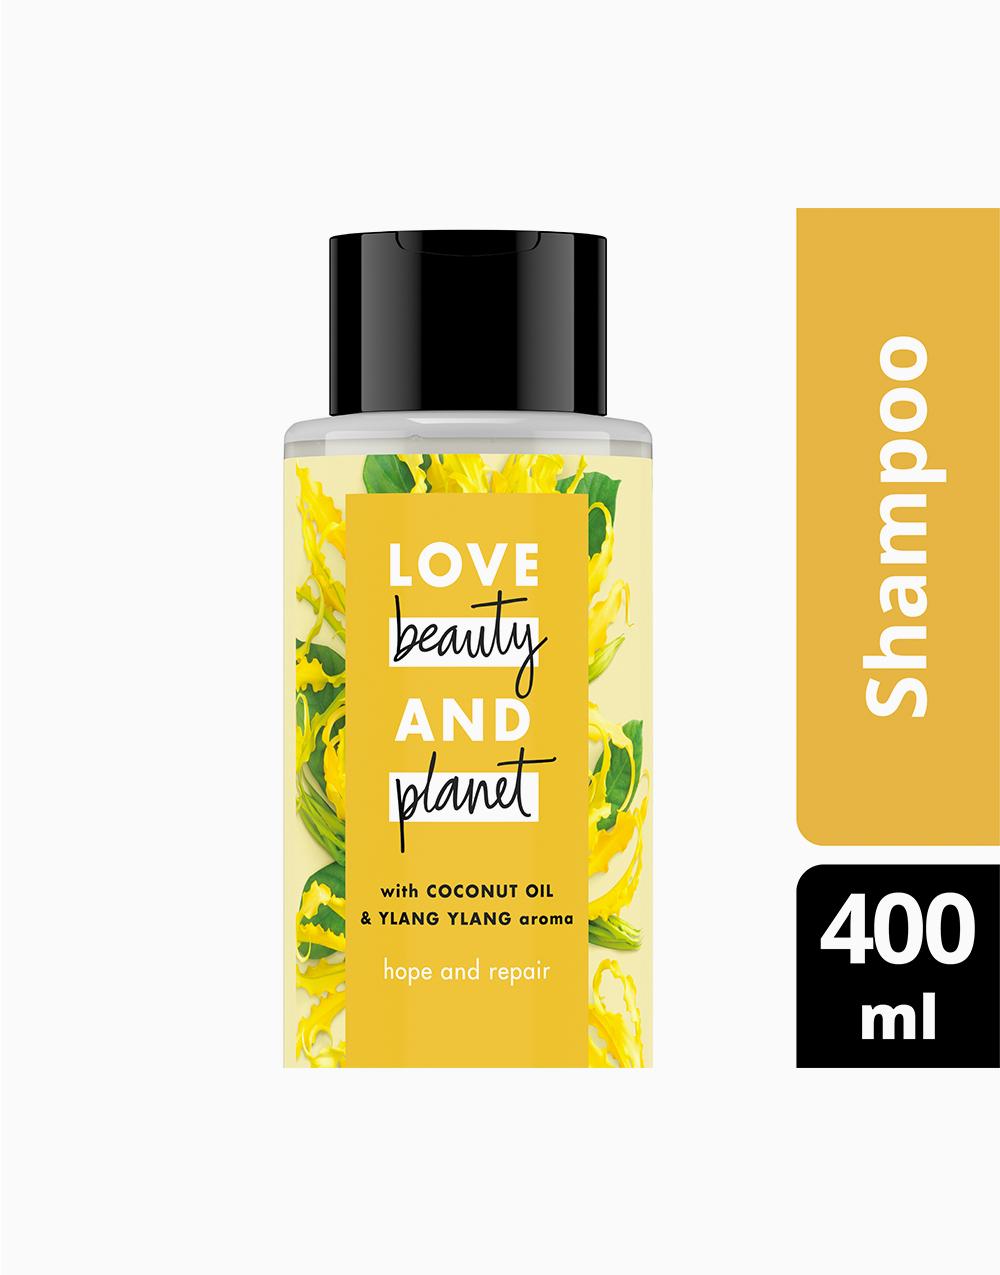 Coconut & Ylang Ylang Shampoo - Hope and Repair (400ml) by Love Beauty and Planet